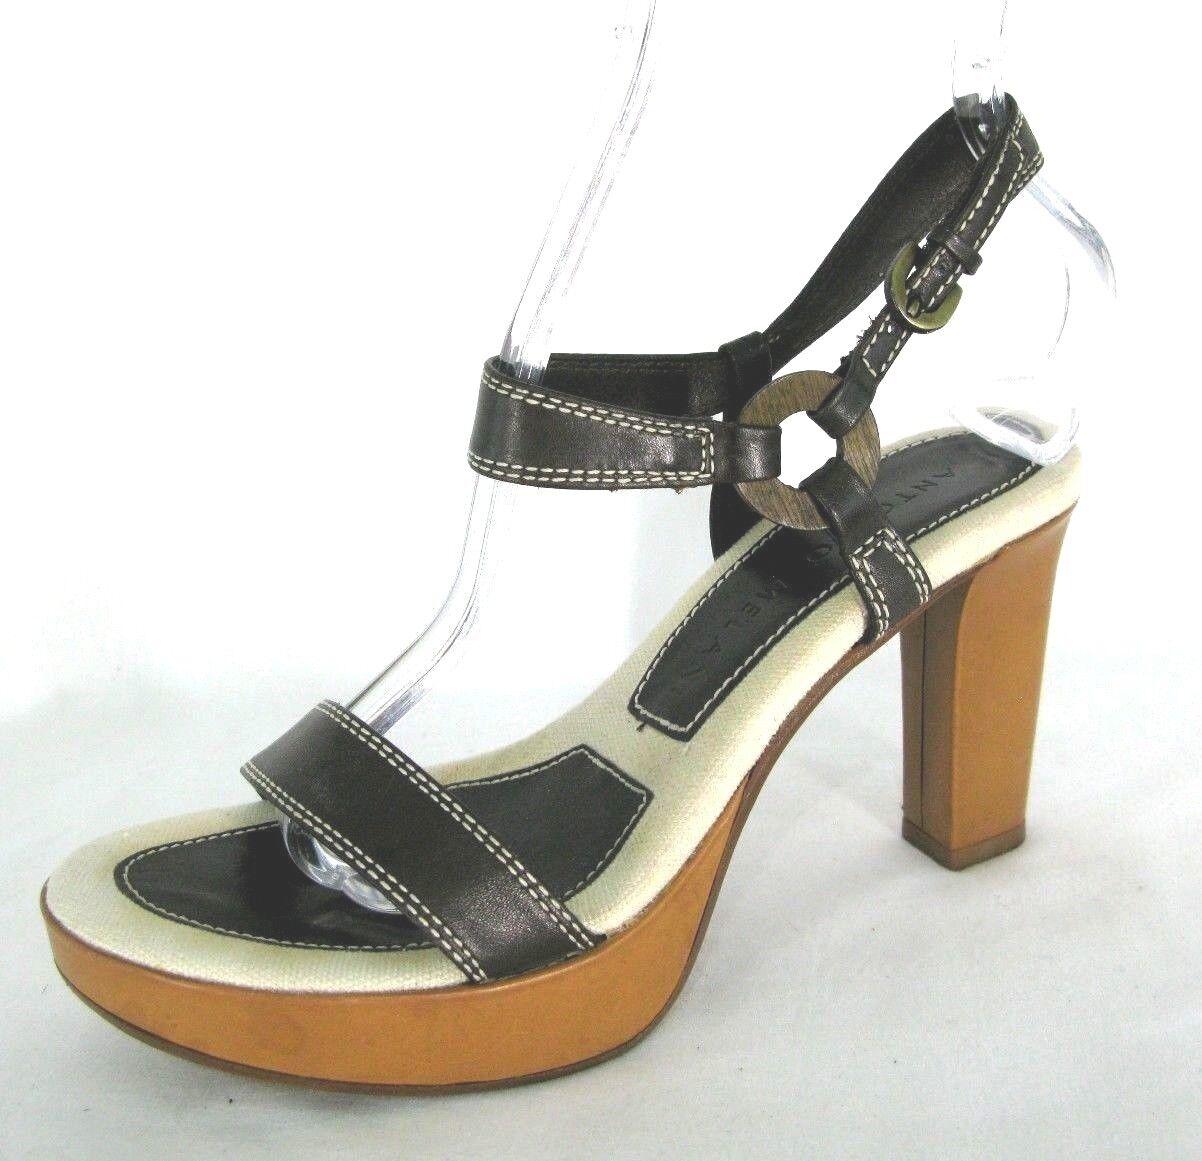 Antonio Melani Shoes Sz 6 Ankle Strap Sandals Heels Platforms Strappy Brown